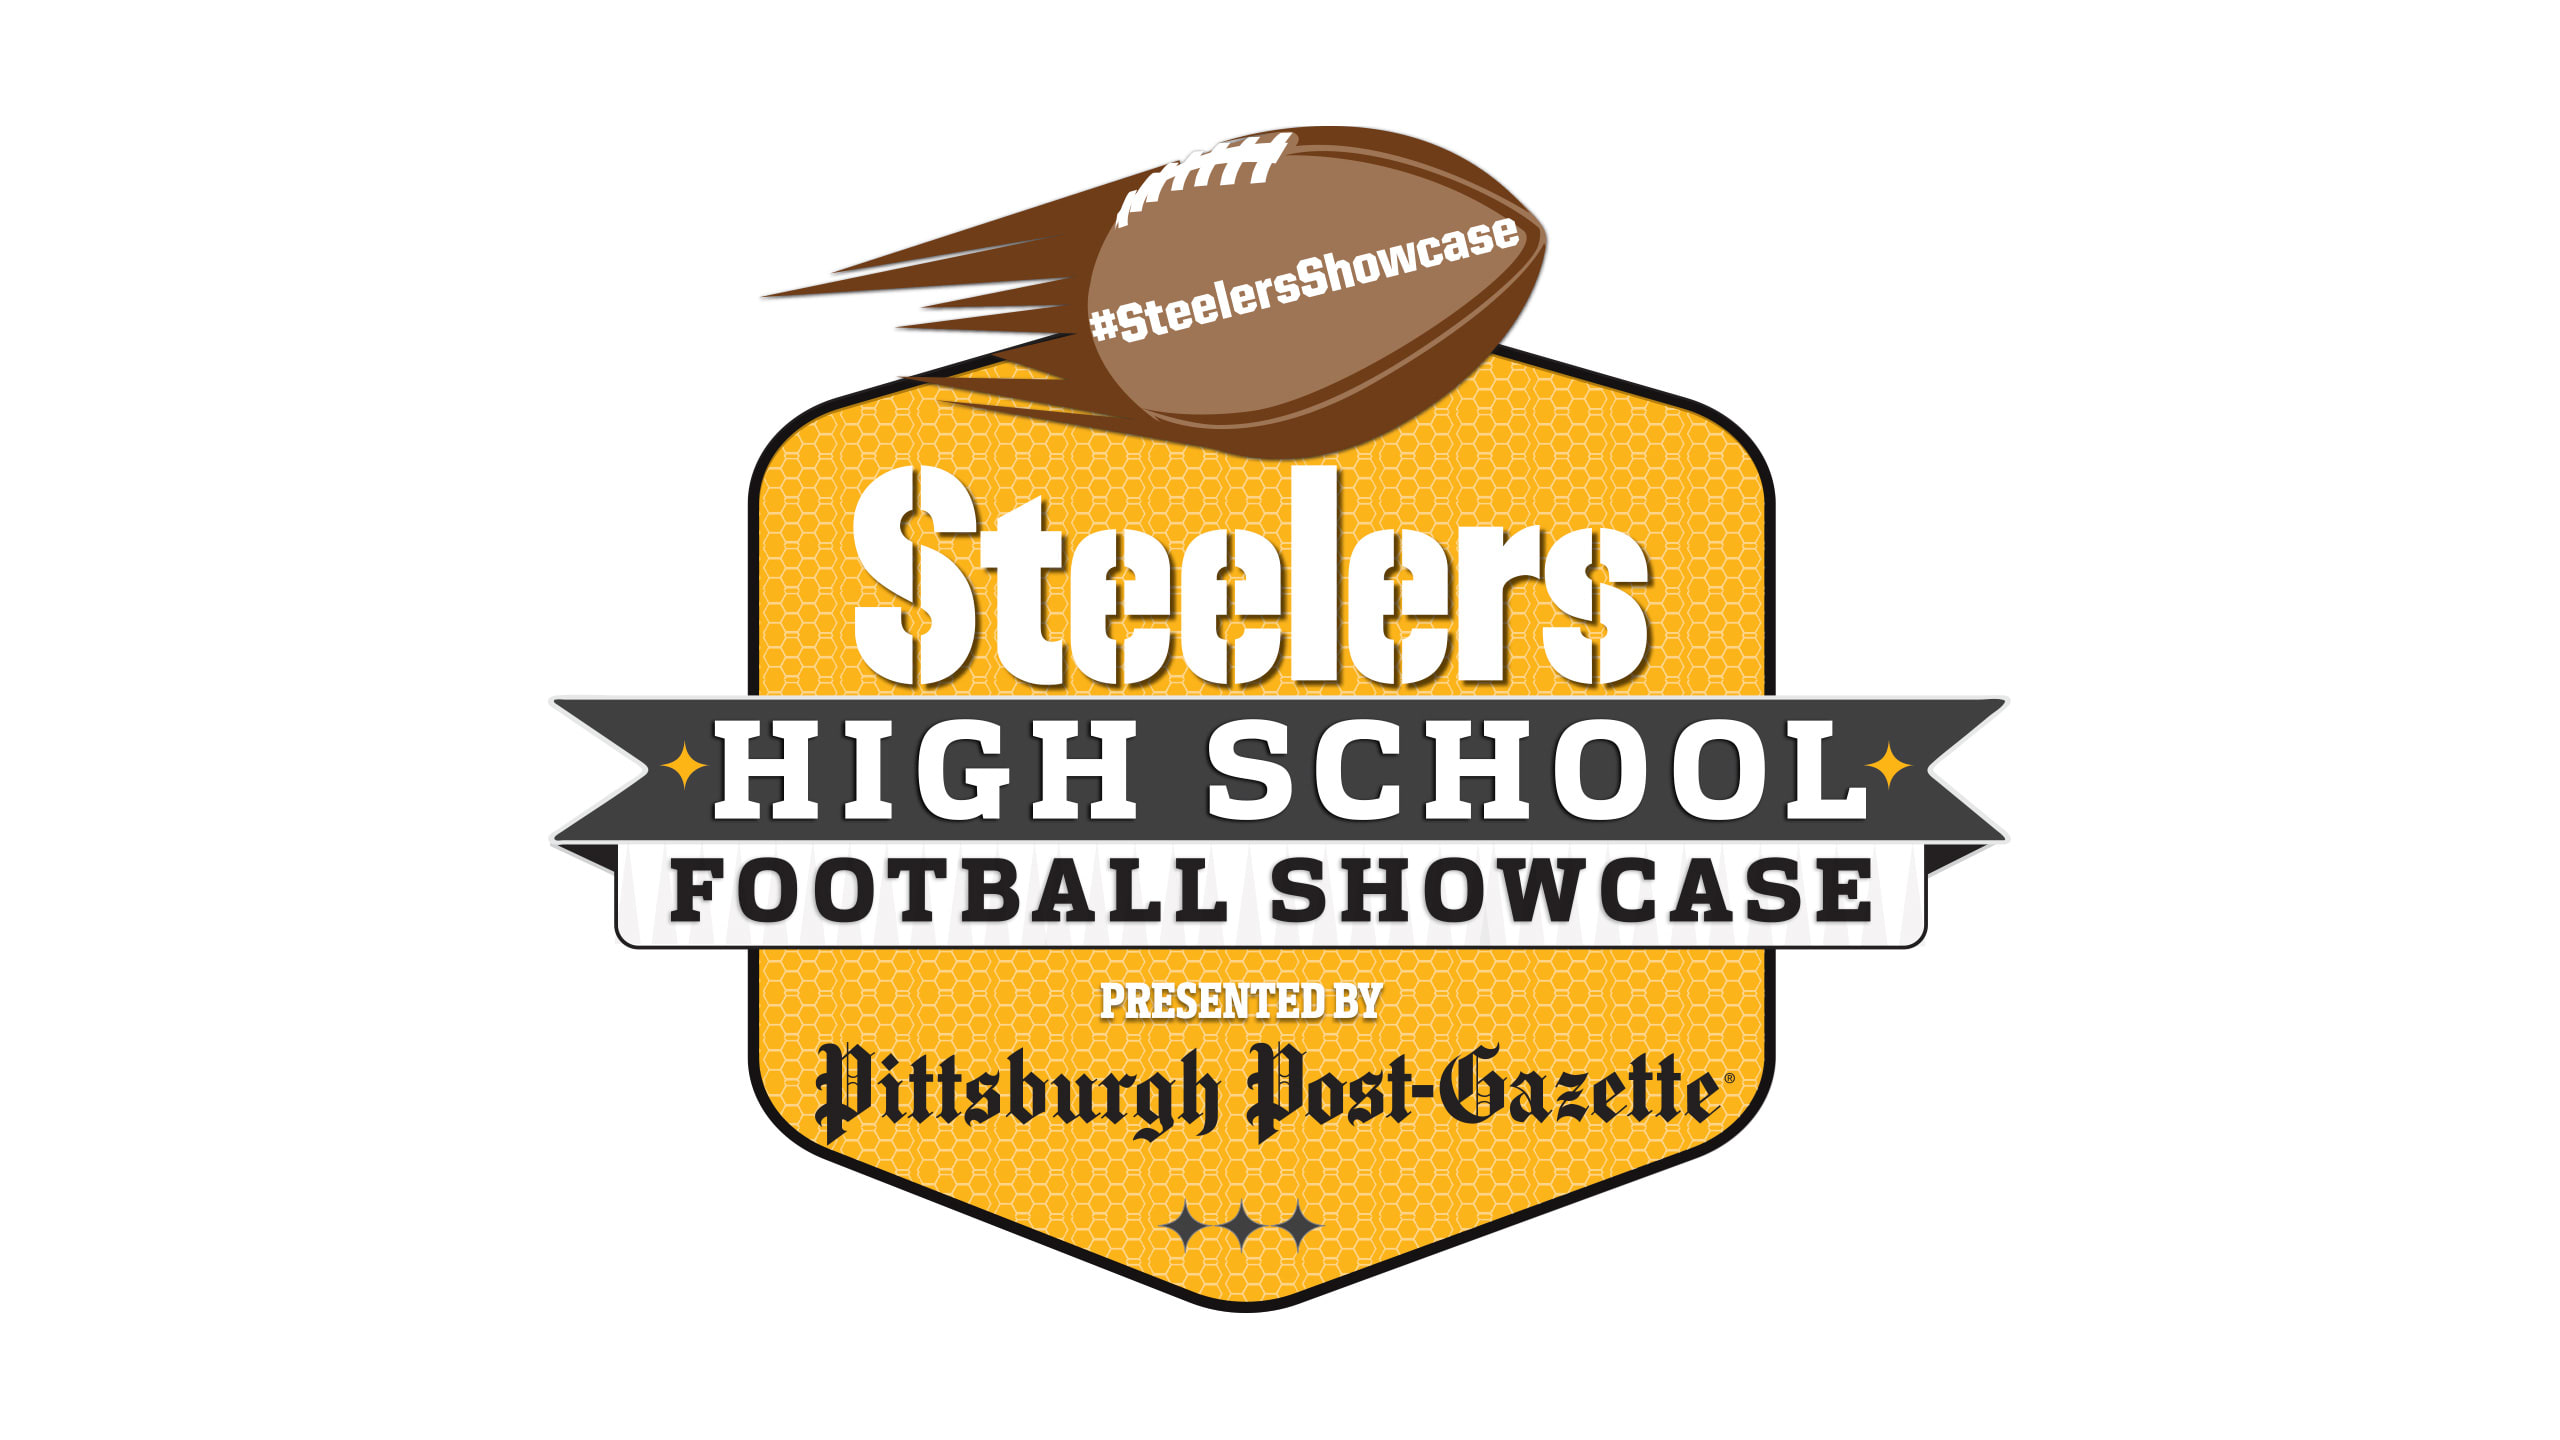 3efad3900 Steelers Youth Football | Pittsburgh Steelers - Steelers.com